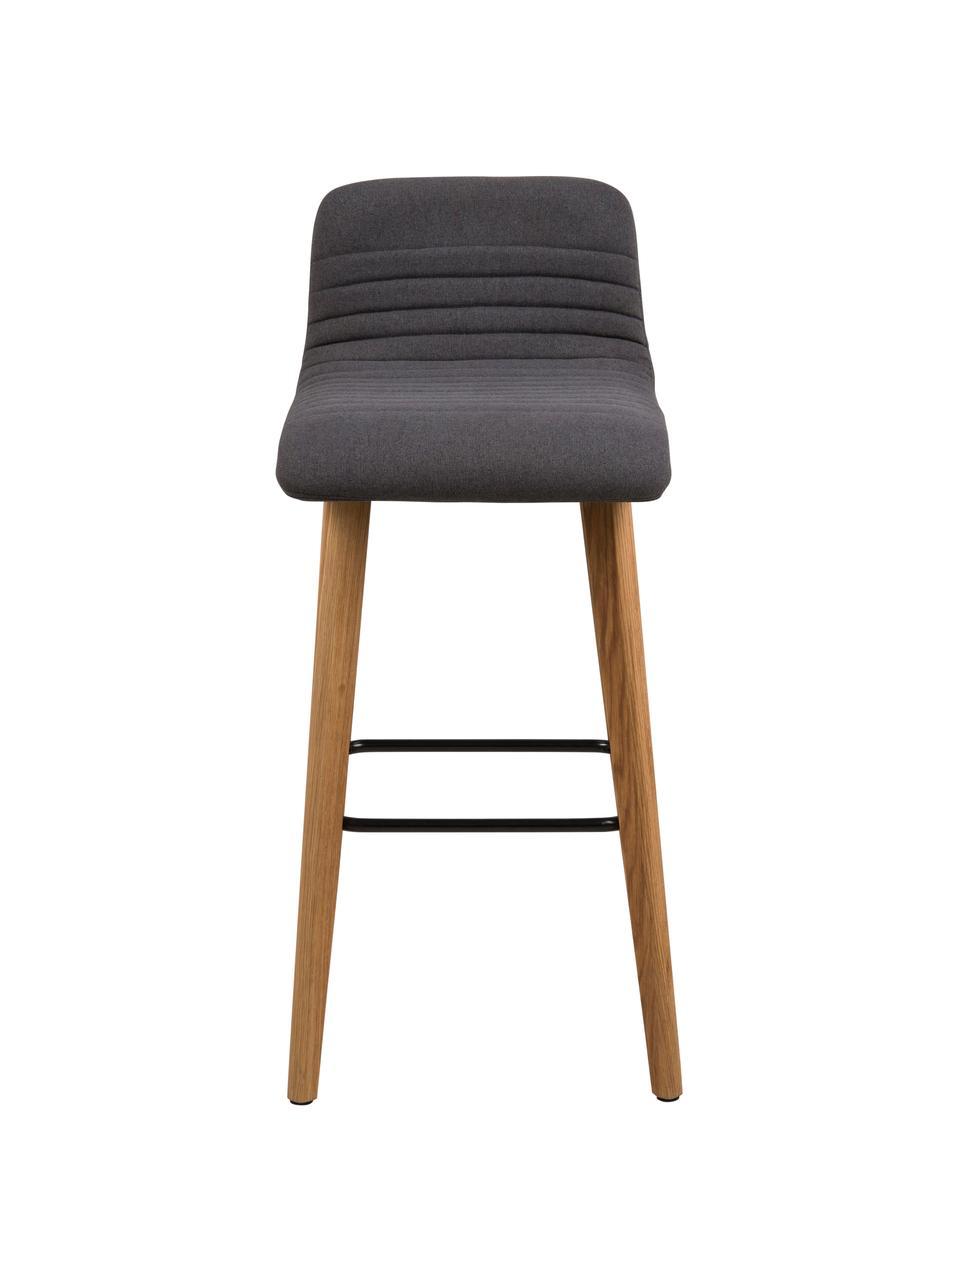 Barstuhl Arosa in Grau, Bezug: Polyester, Beine: Eichenholz, Sitzschale: Sperrholz, Bezug: Anthrazit Beine: Eichenholz Fußstütze: Schwarz, 44 x 101 cm